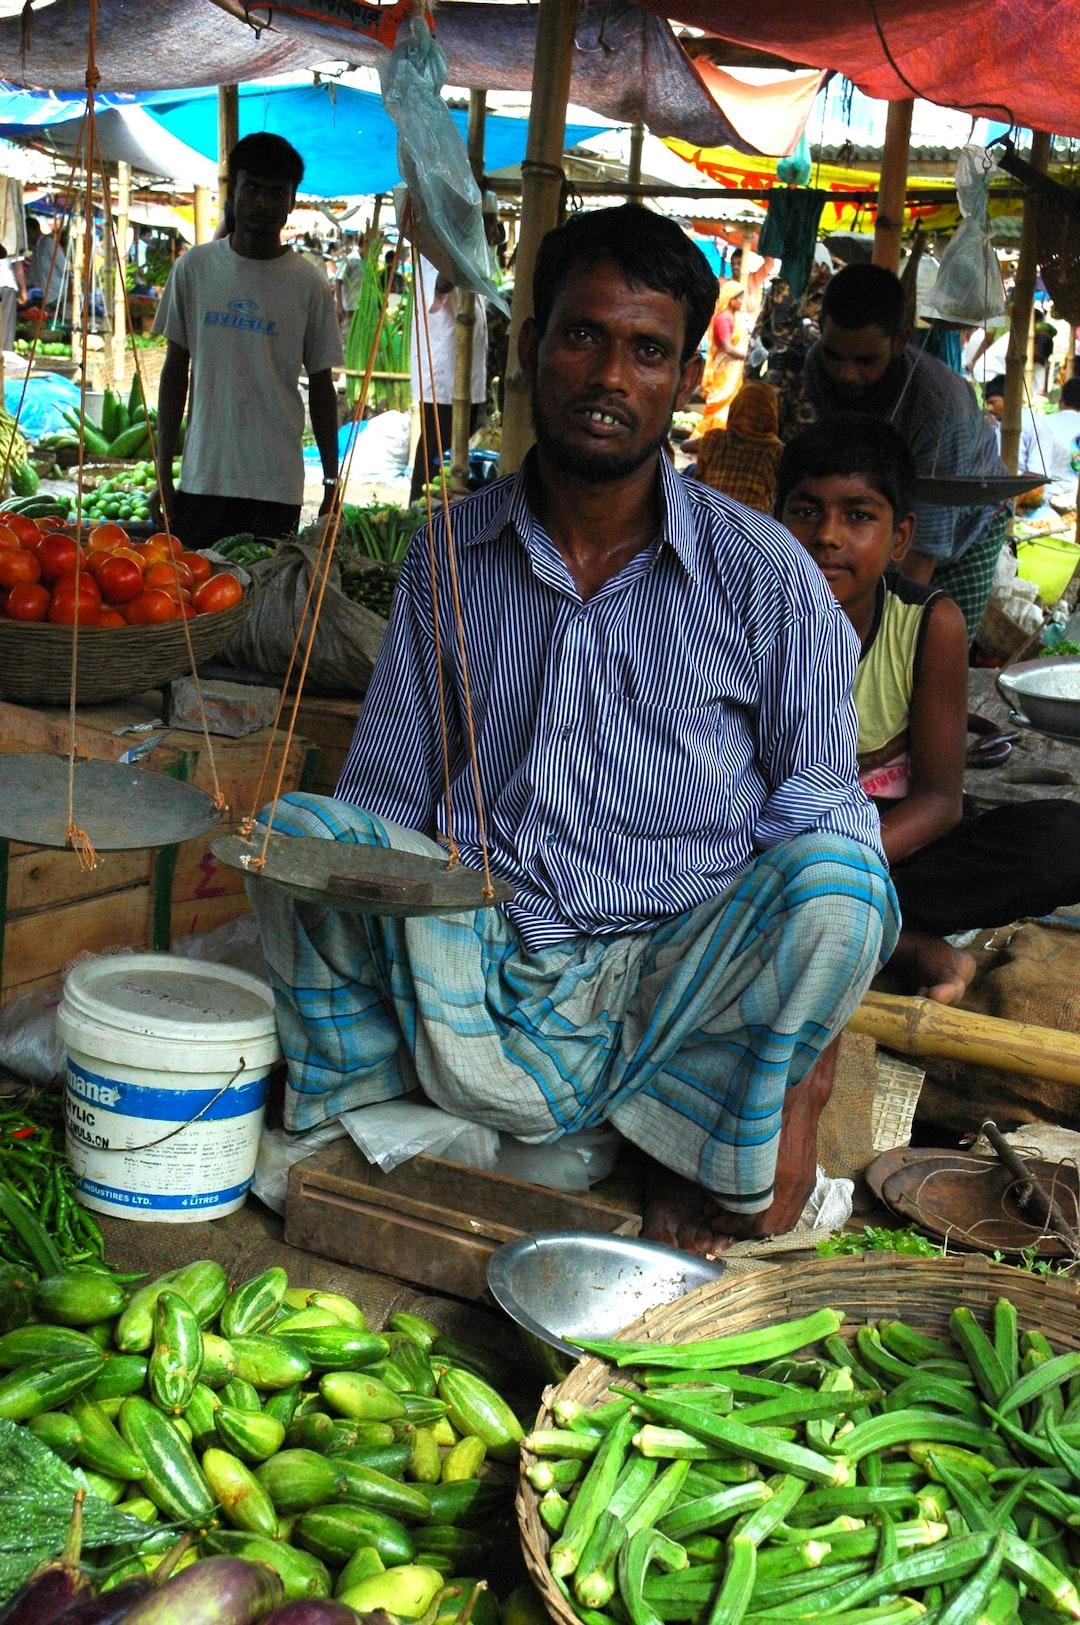 Market vendor, scales, okra, eggplant, squash, green beans, vegetables, market, near the airport, Dhaka, Bangladesh